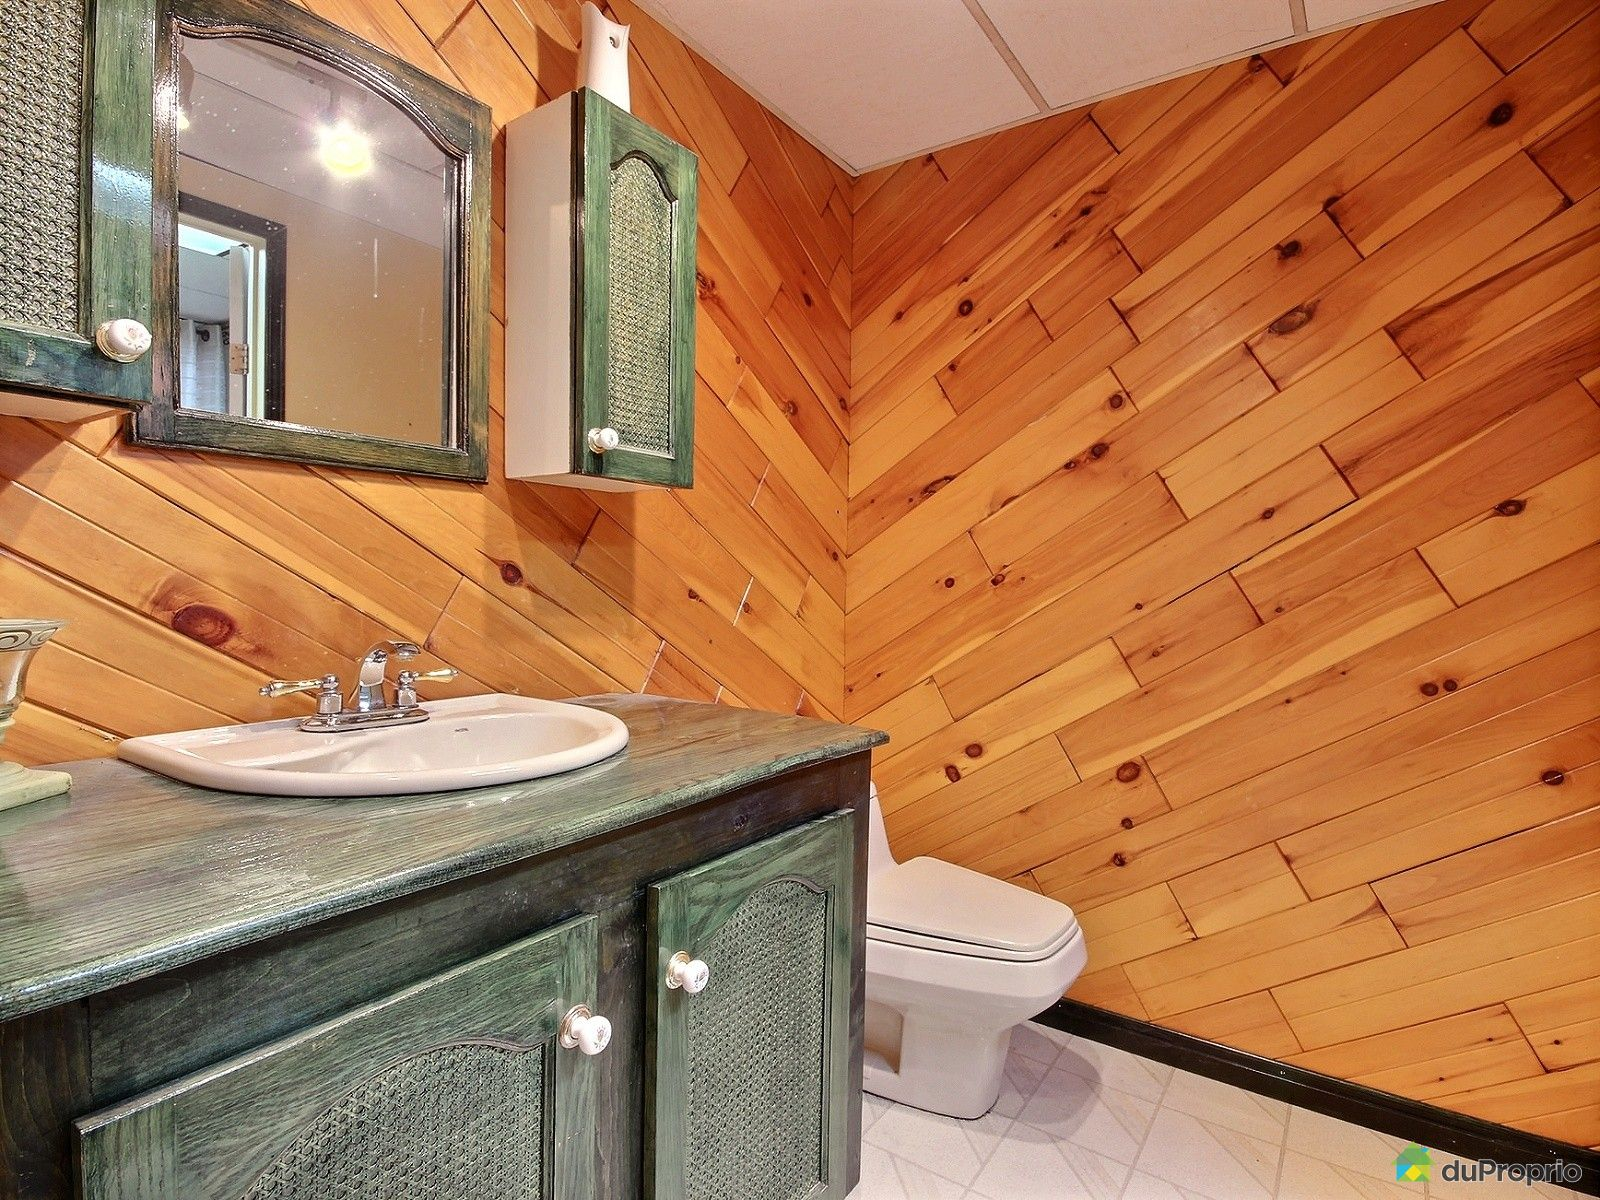 Maison vendre st andr avellin 10 rue philippe lacoste for Prix salle de bain sous sol